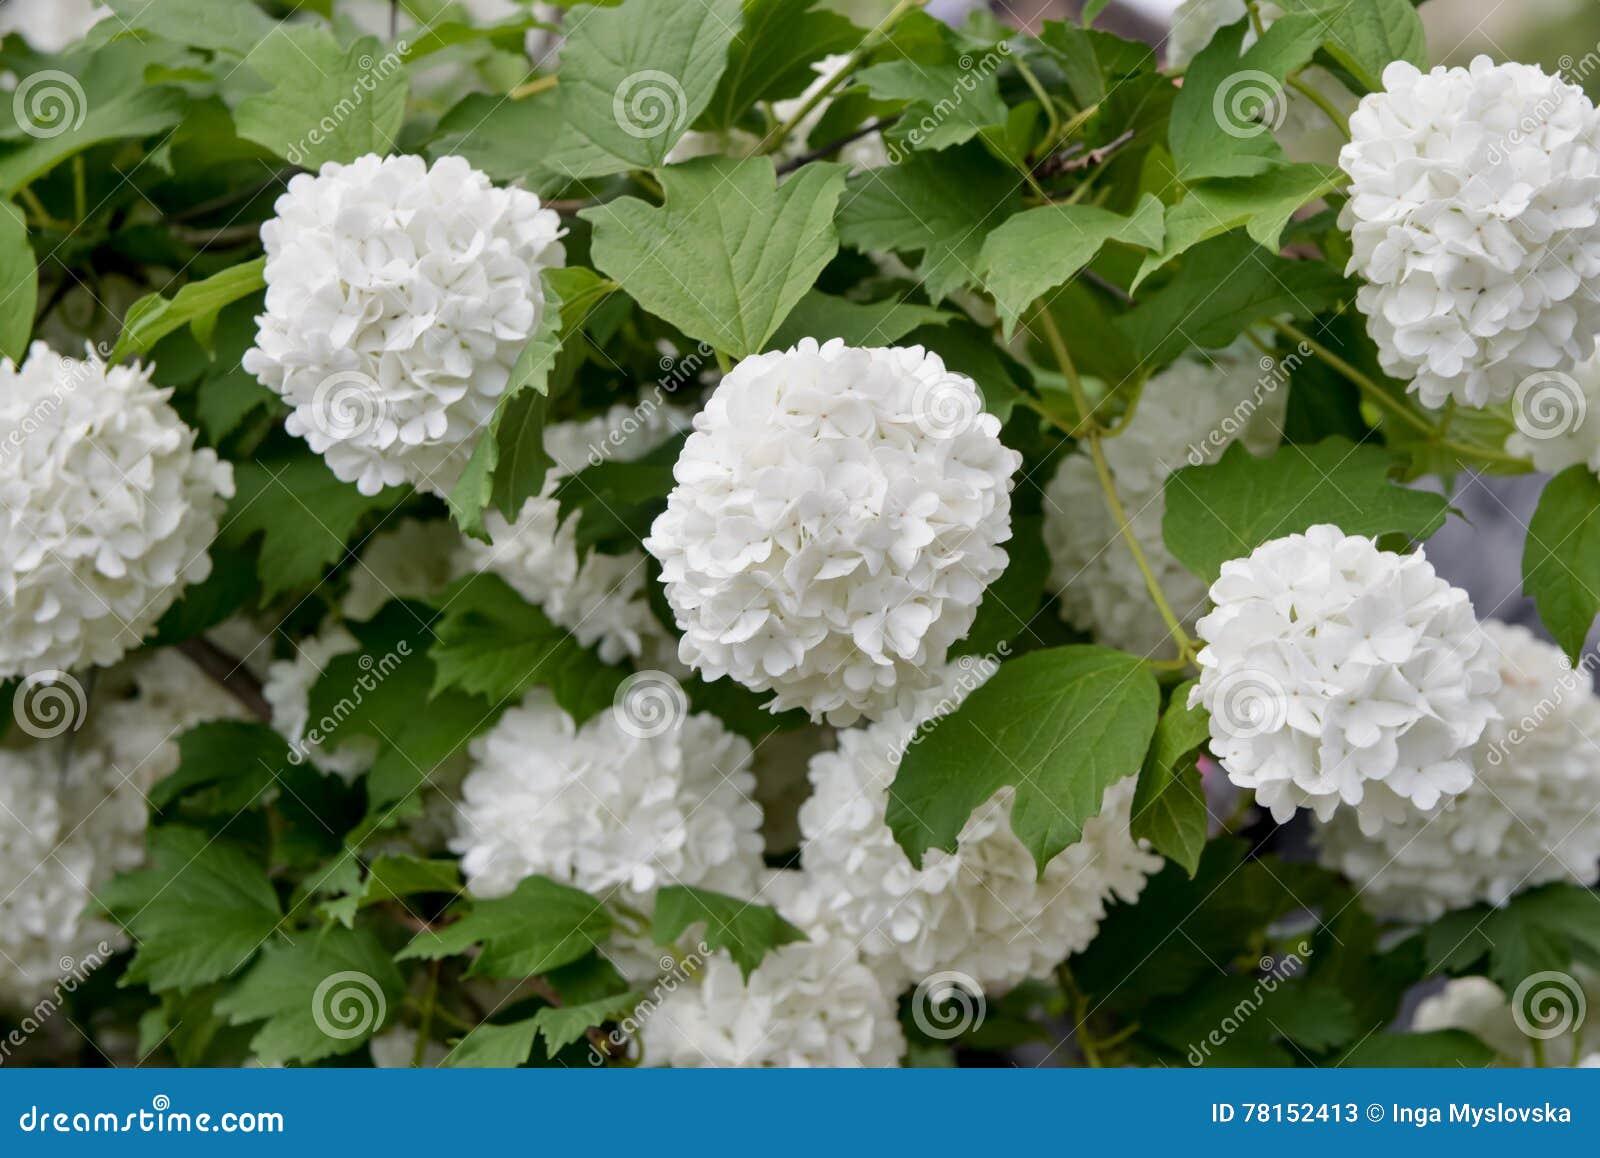 Ball Inflorescence Viburnum Bush White Flowers Stock Photo